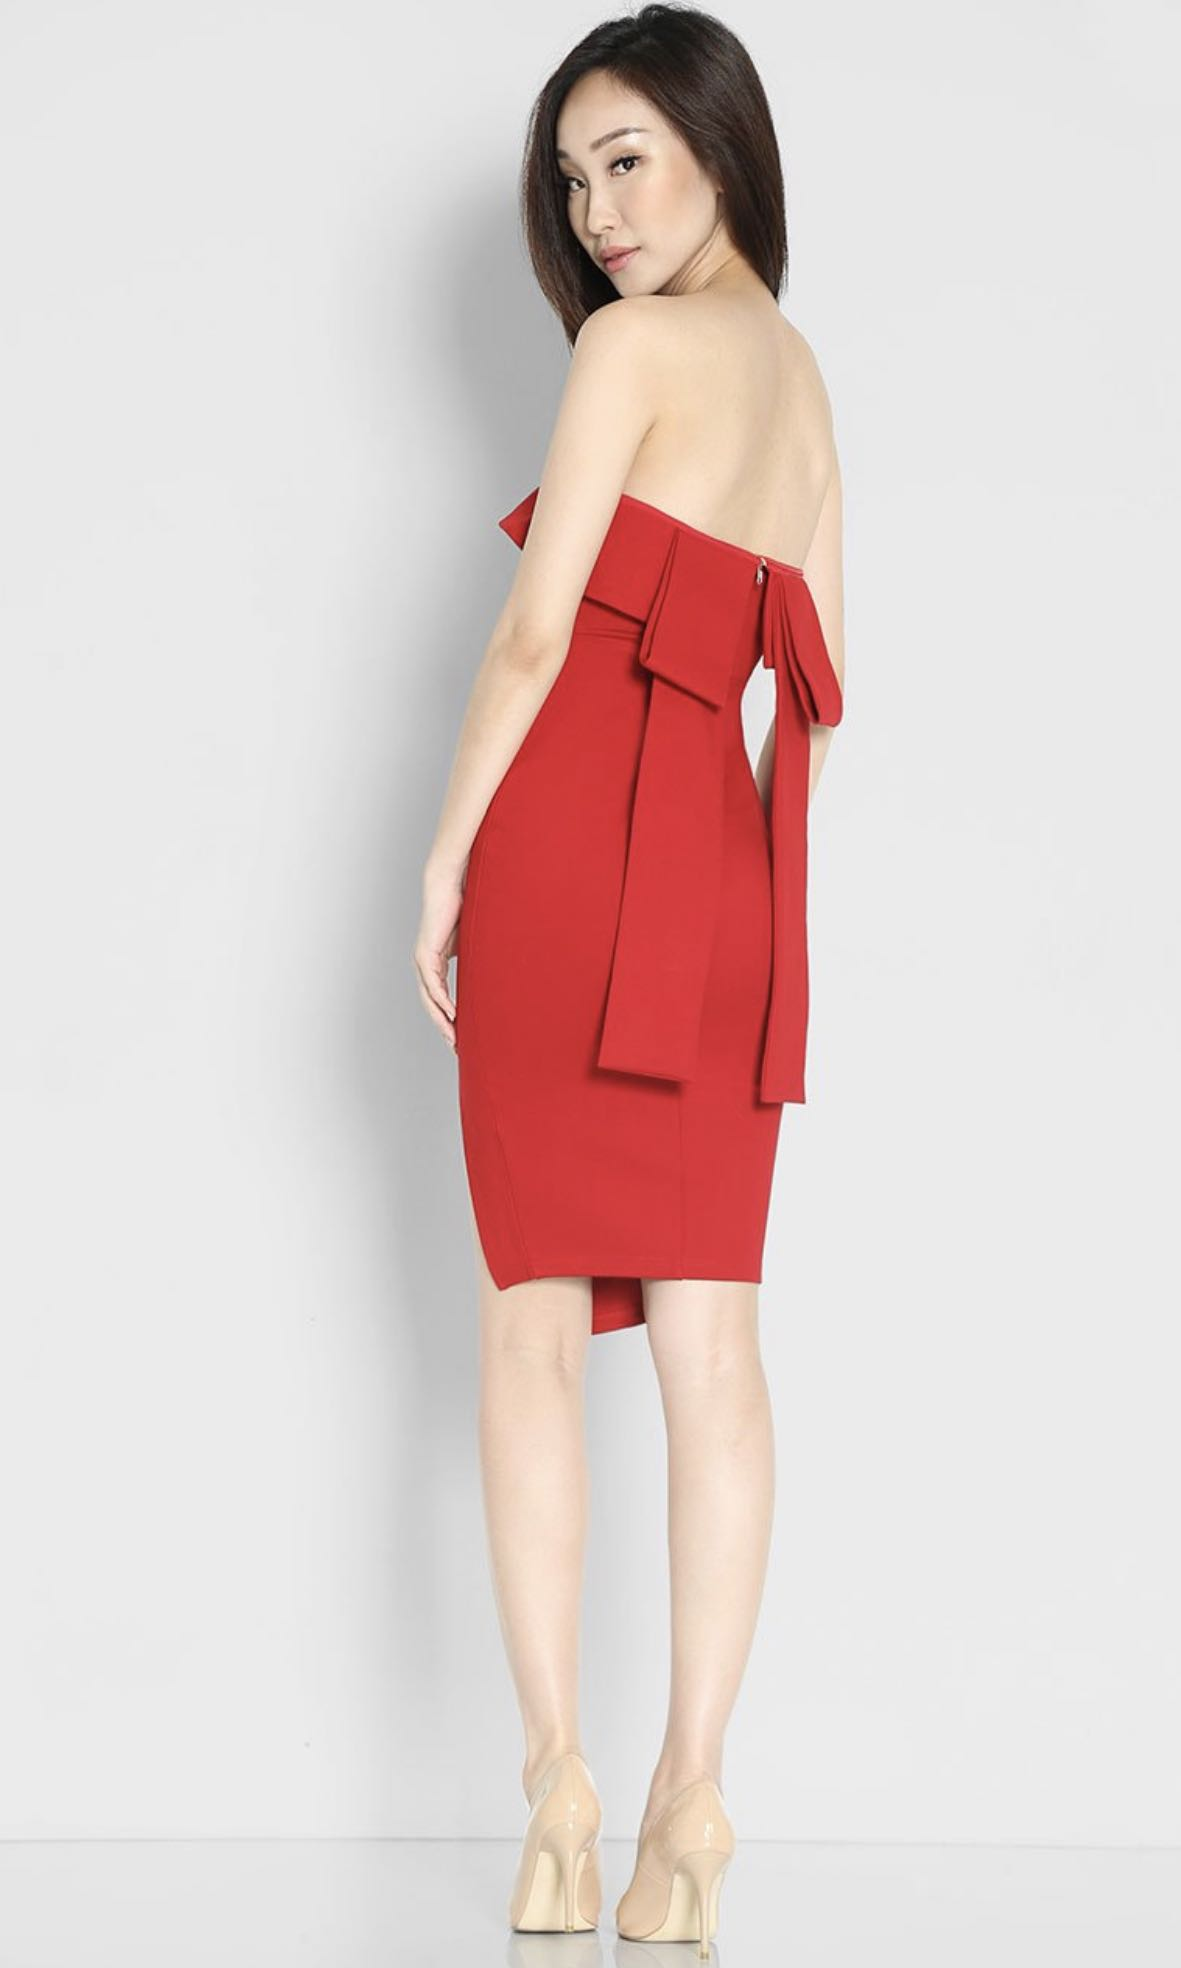 1bc2f3d19 LARA J VERA GEORGIA DRESS, Women's Fashion, Clothes, Dresses ...